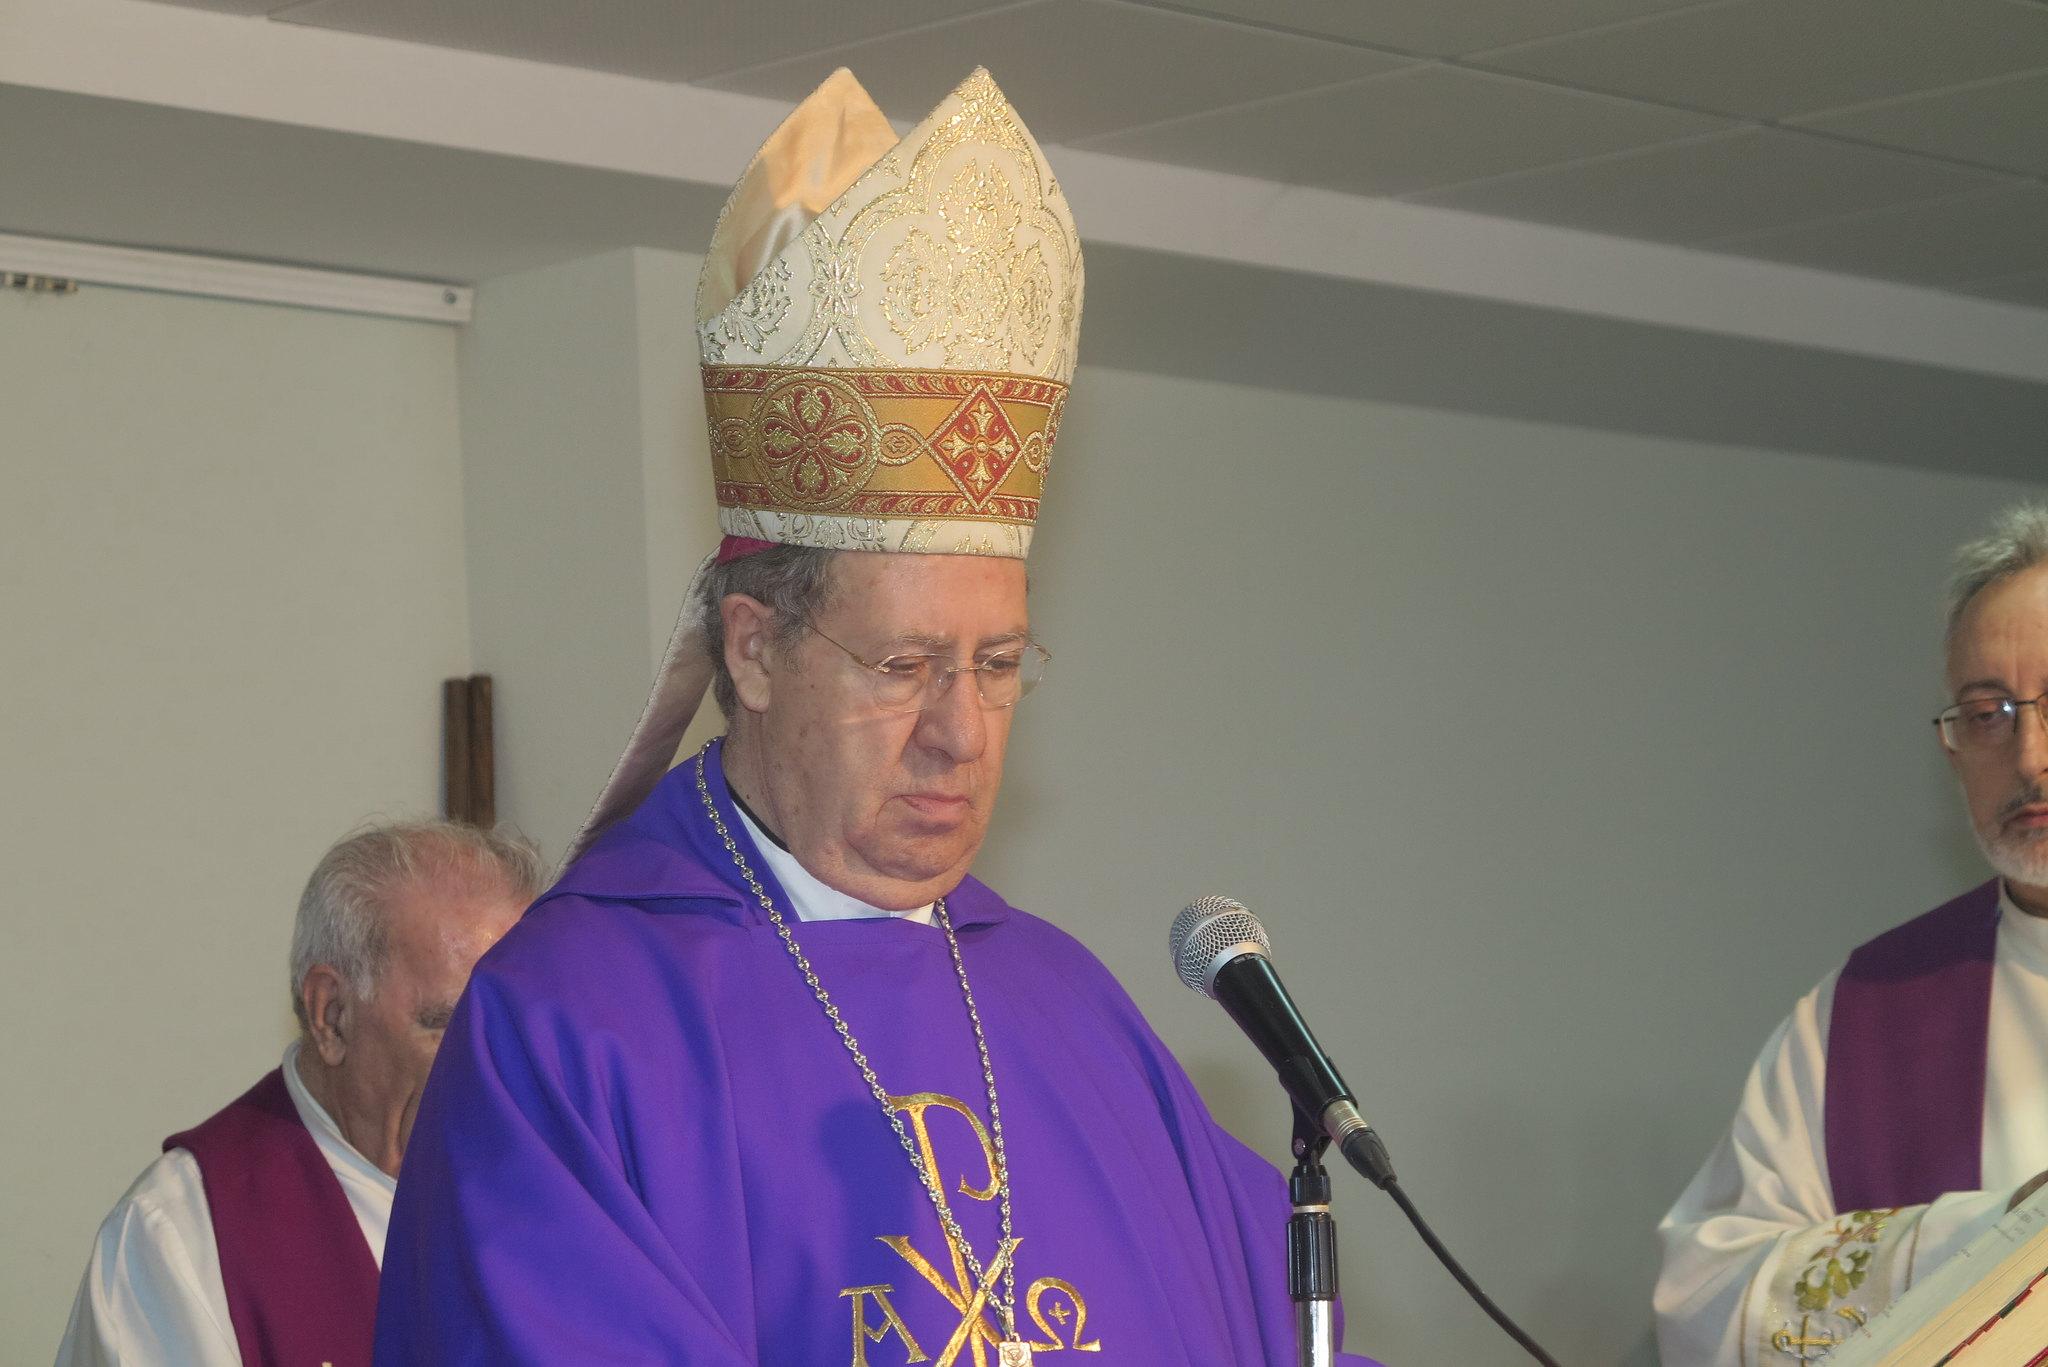 (2016-02-13) - Inauguración Virgen de Lourdes, La Molineta - Archivo La Molineta 2 (38)